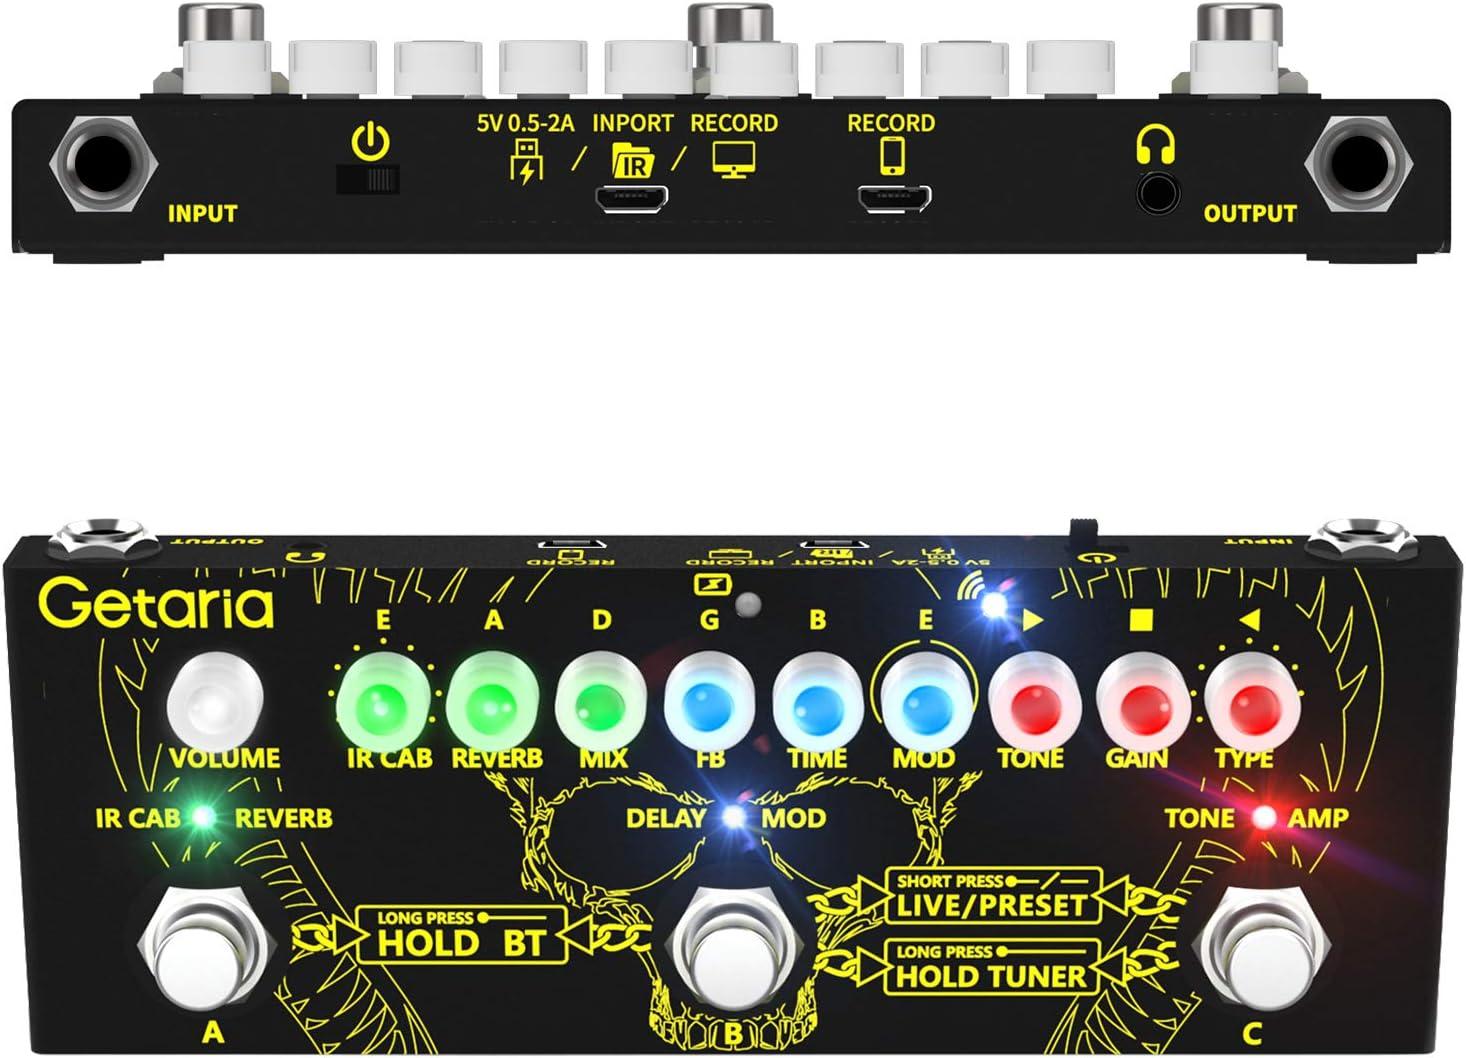 Getaria Pedal de efectos multifuncional para guitarra Cargar Archivo IR Pedal de Efectos Combinados para Guitarra con Overdrive Distortion Delay Modulación de reverberación Pedal de efectos